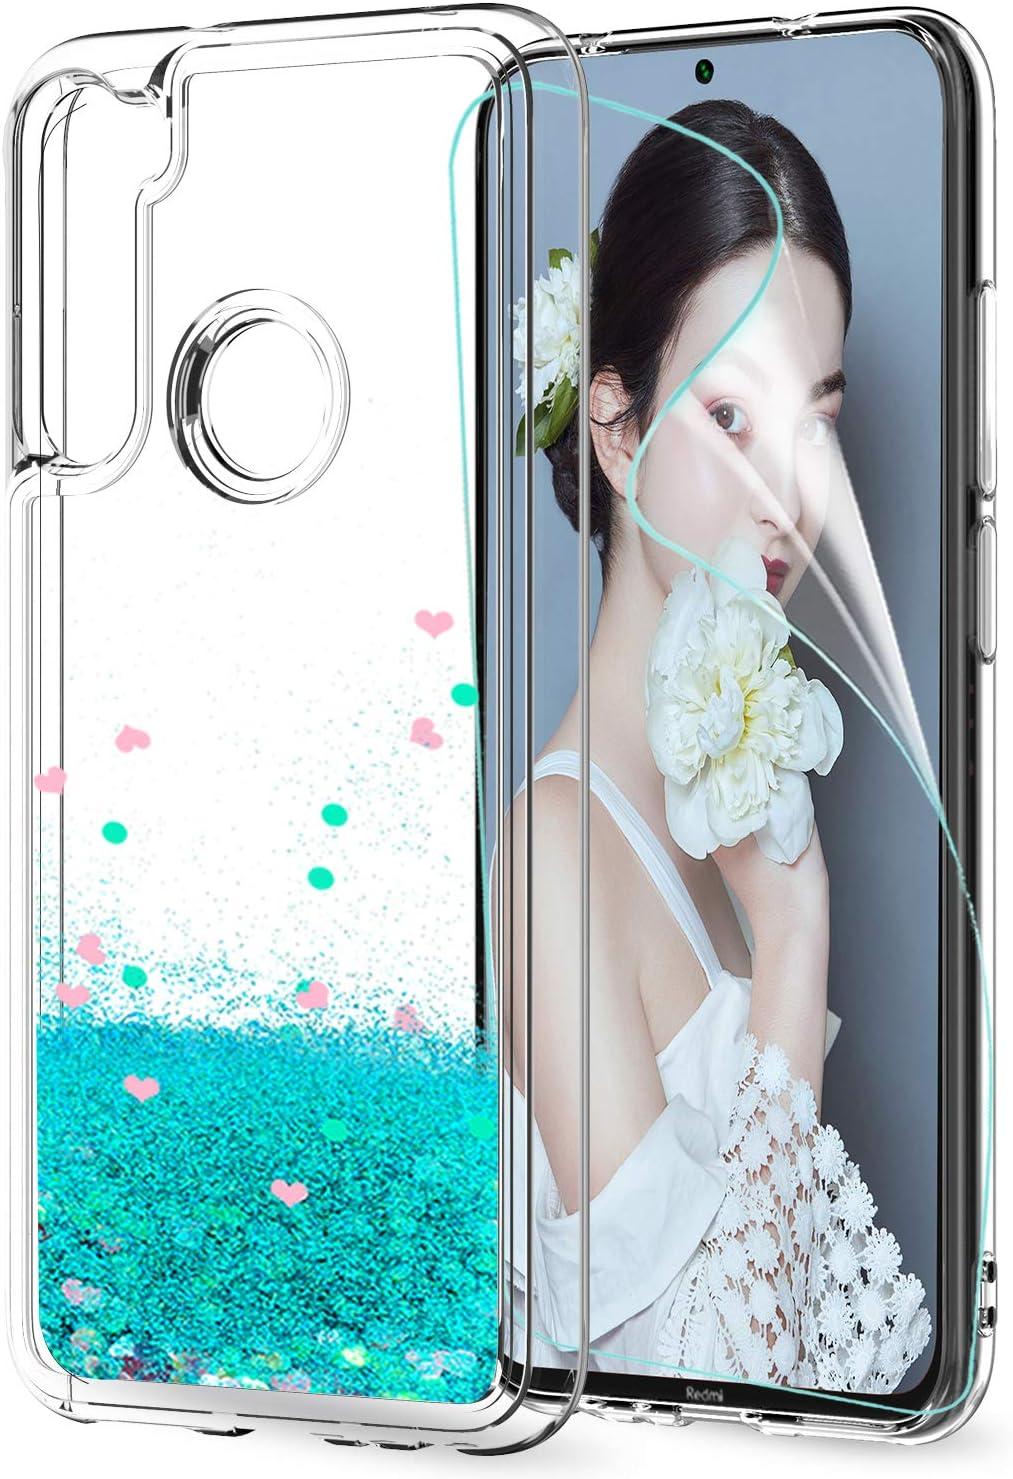 LeYi Funda Xiaomi Redmi Note 8T Silicona Purpurina Carcasa con HD Protector de Pantalla, Transparente Cristal Bumper Telefono Gel TPU Fundas Case Cover para Movil Redmi Note 8T ZX Verde